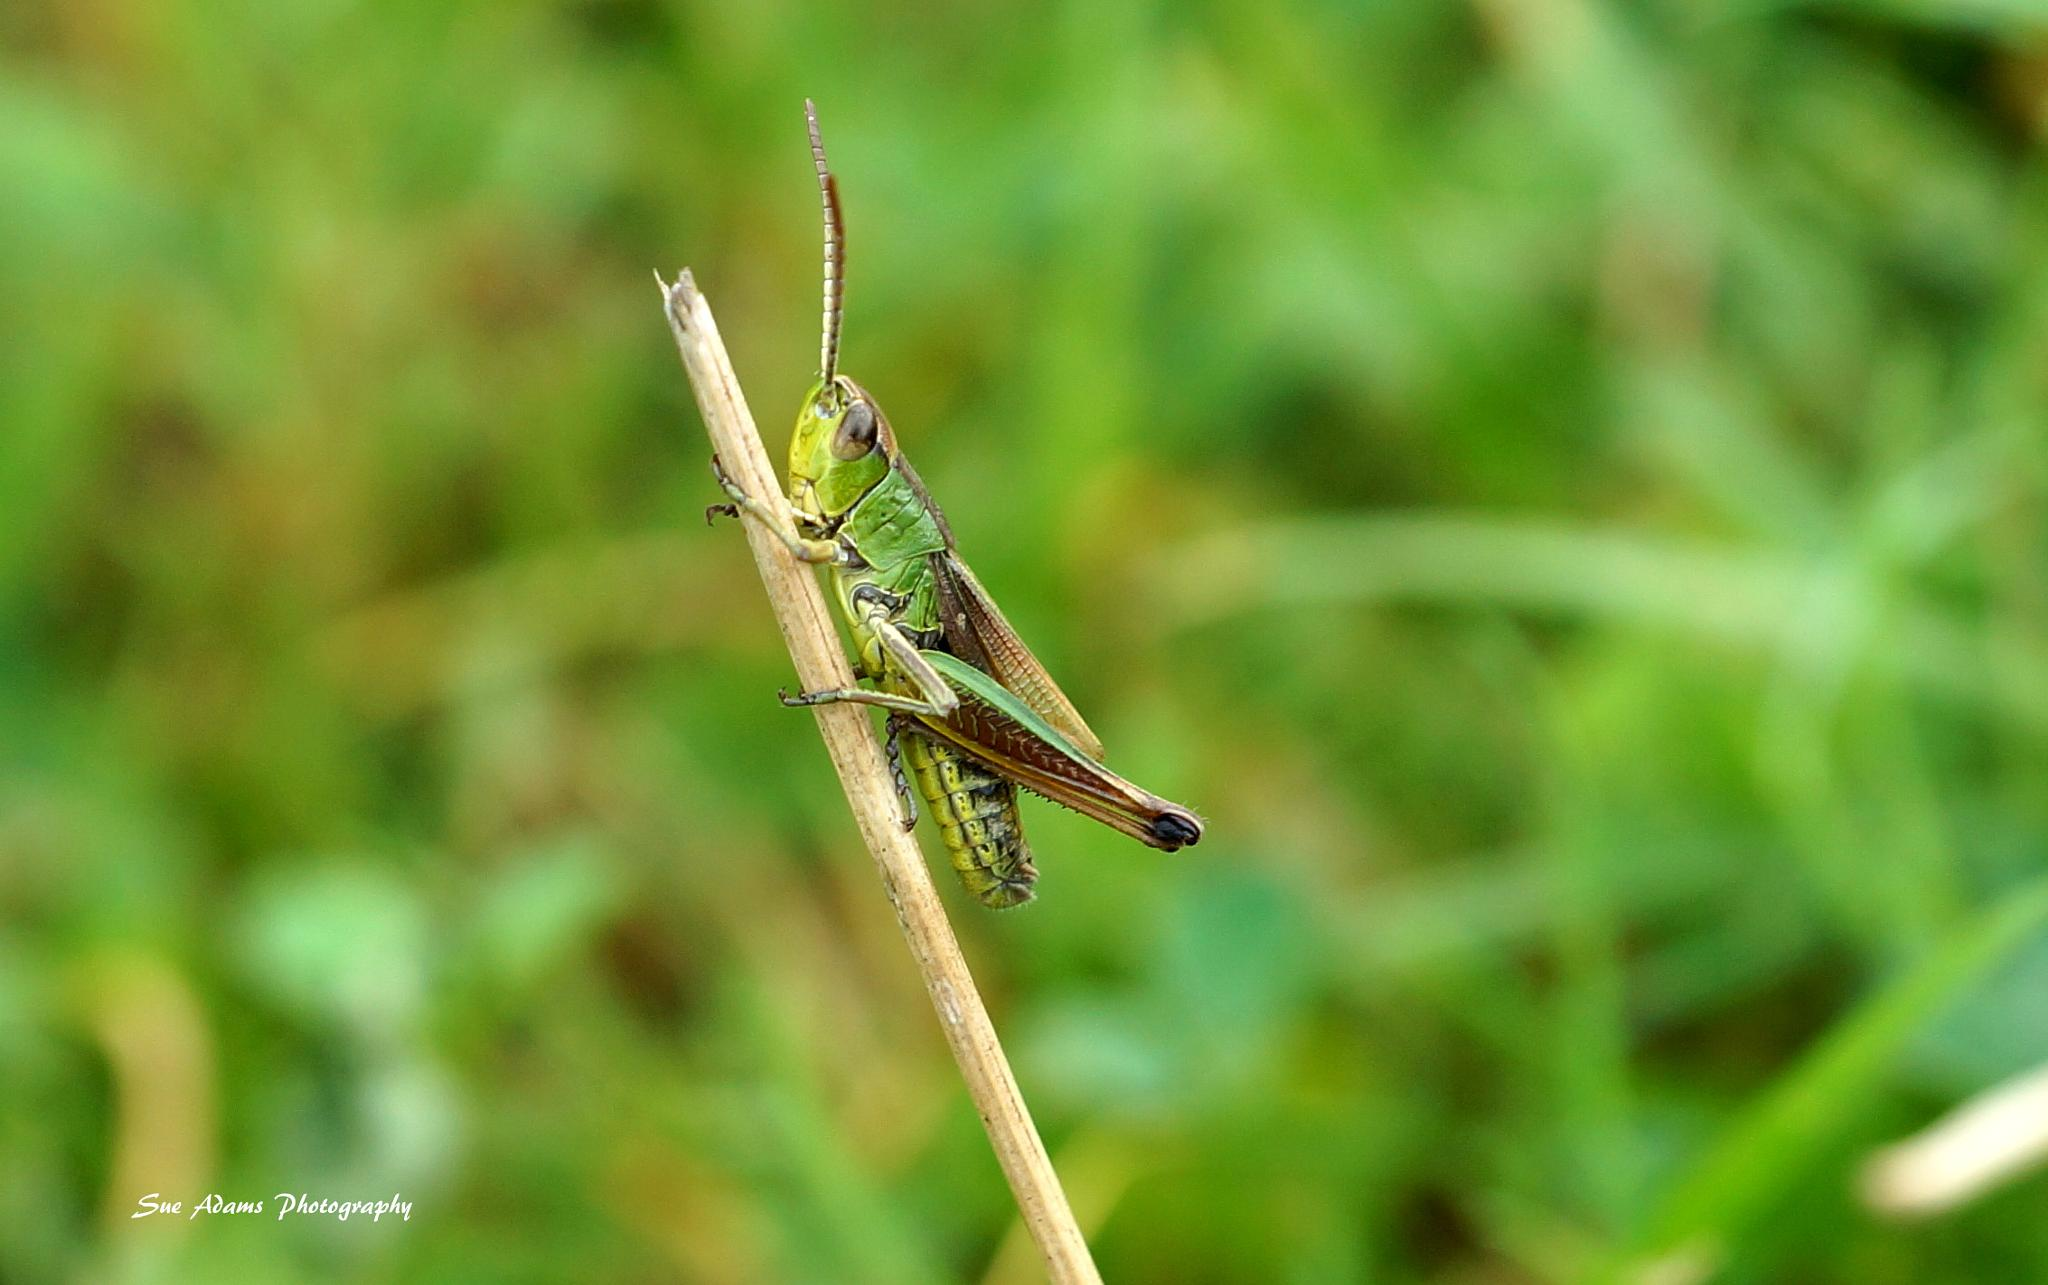 Grasshopper by Sue Adams Photography